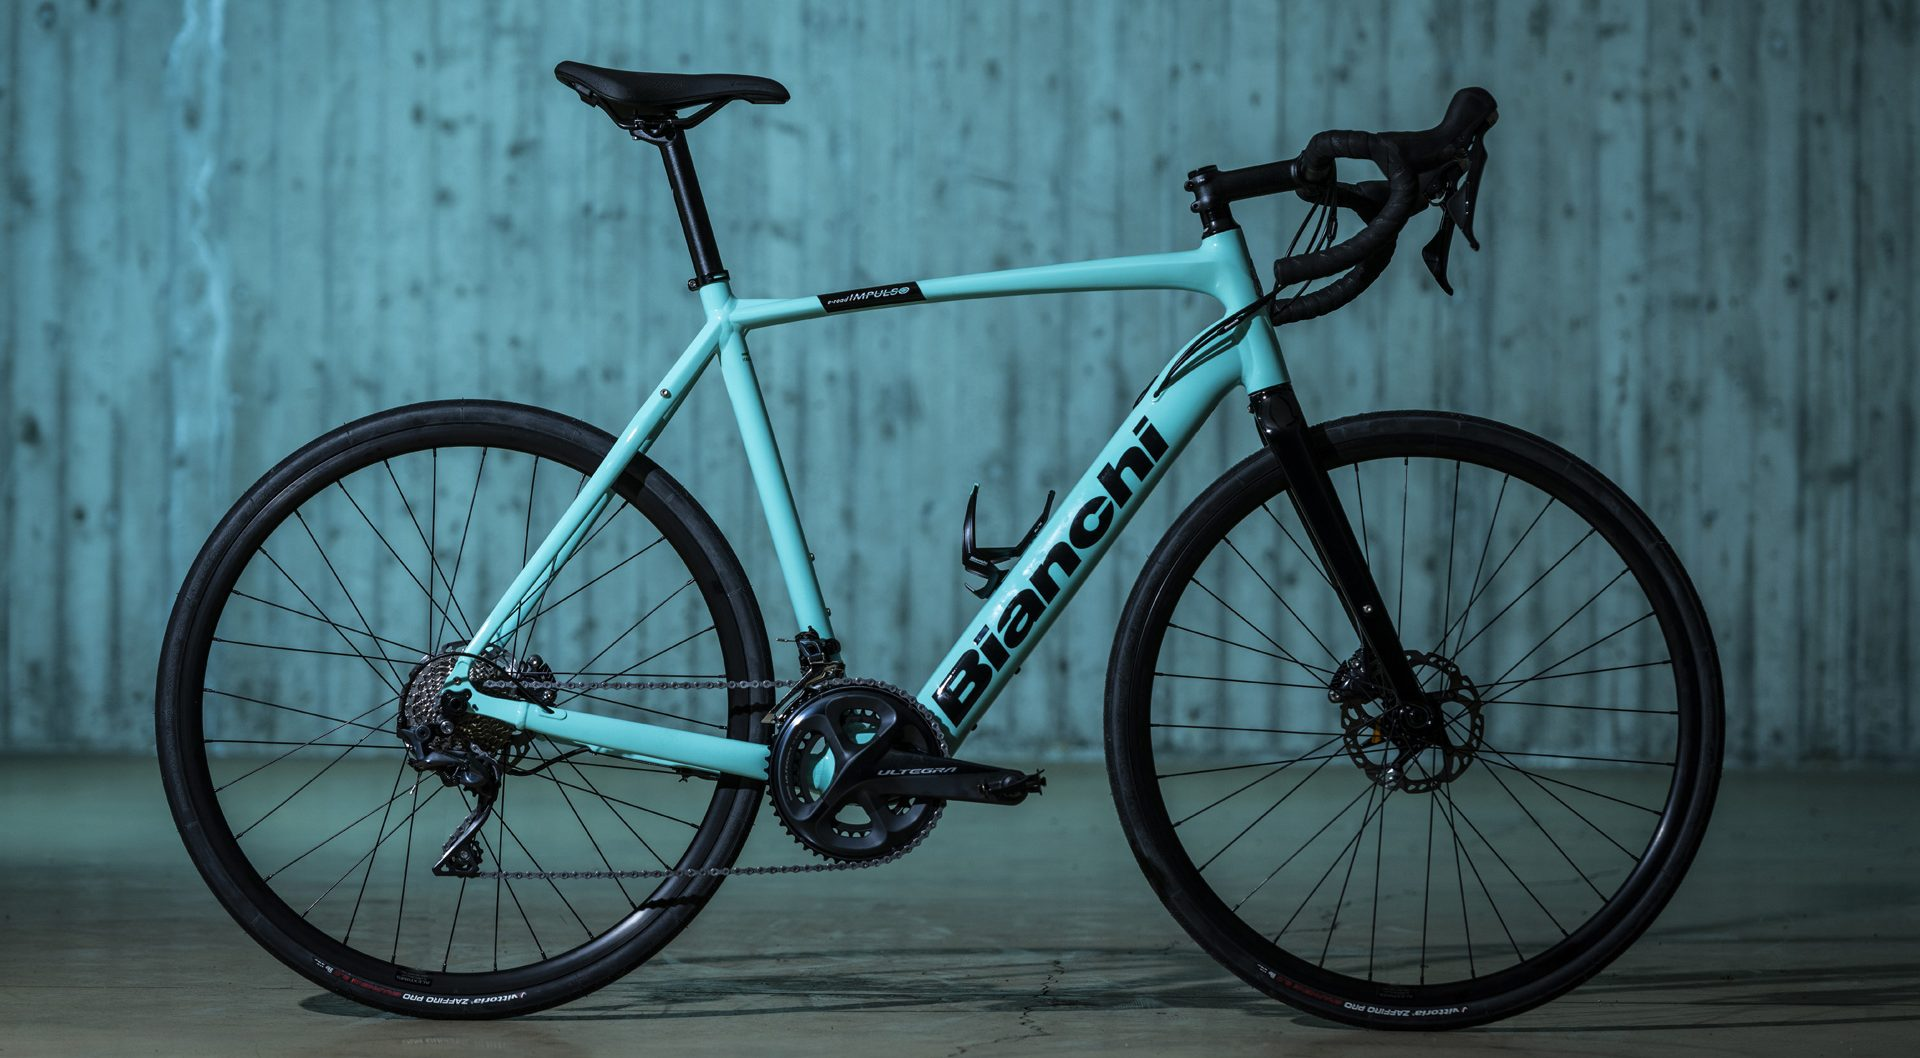 Bianchi E IMPULSO aluminium frame